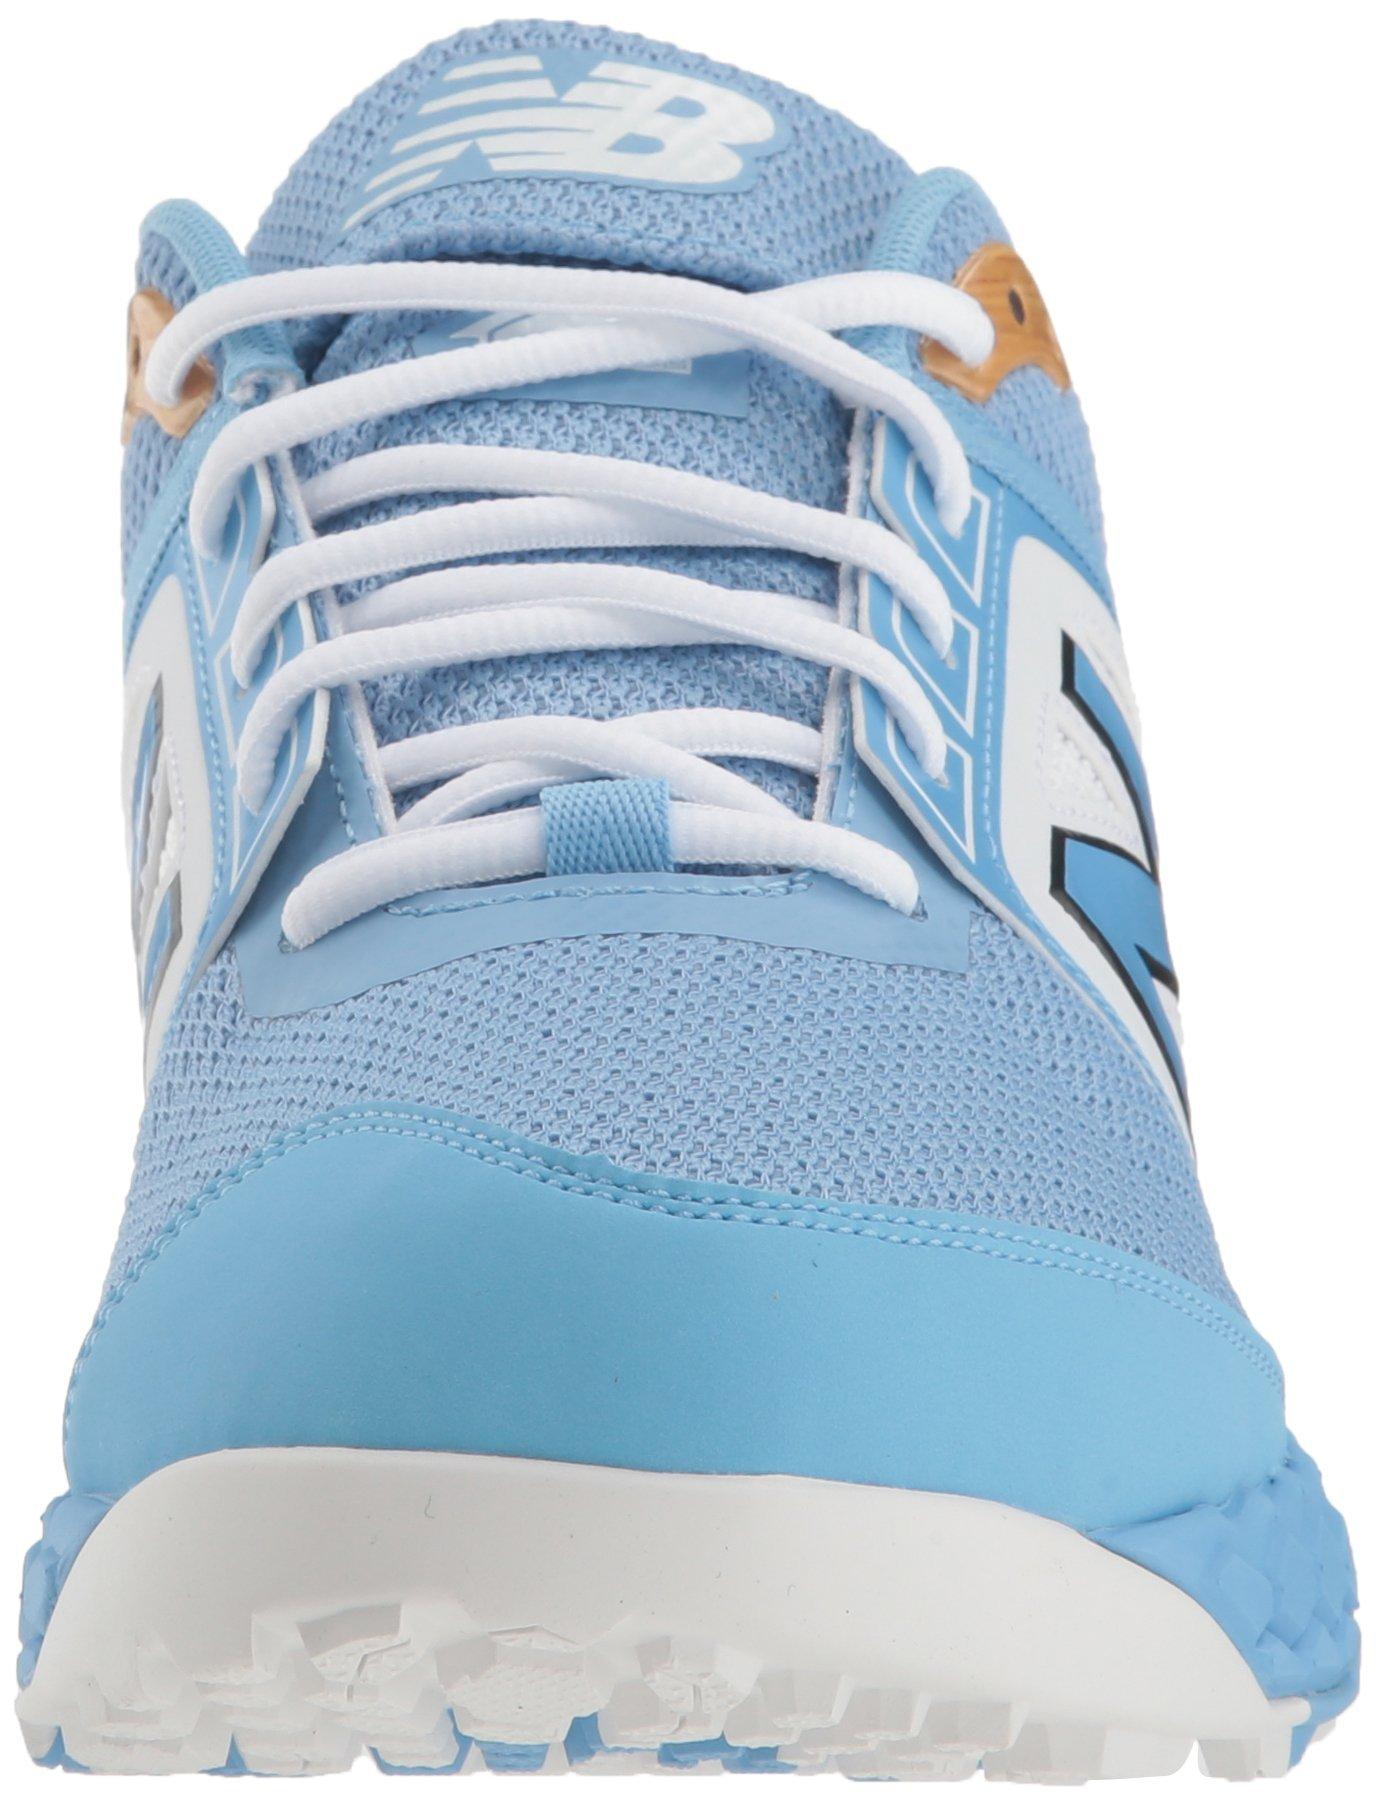 New Balance Men's 3000v4 Turf Baseball Shoe, Light Blue, 5 D US by New Balance (Image #4)